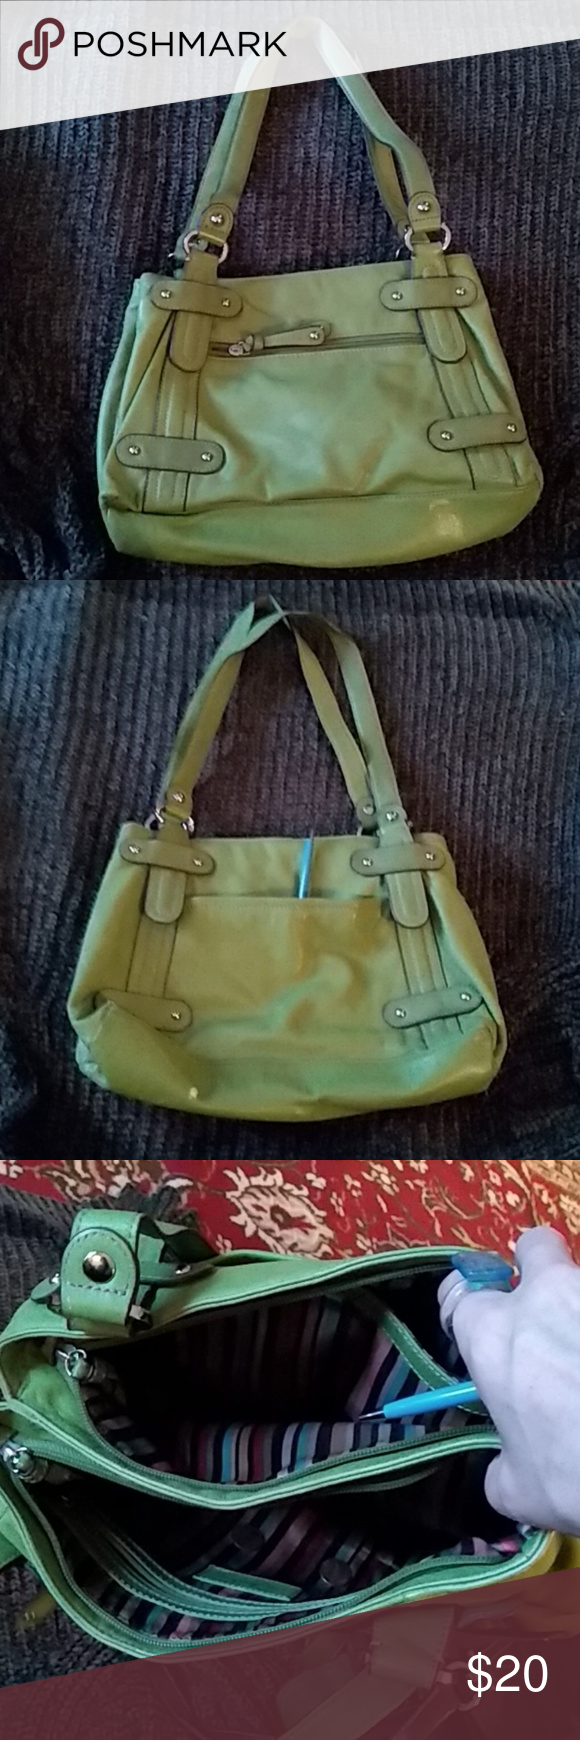 Injusto pureza perdonado  I just added this listing on Poshmark: Medium shoulder bag, granny smith  green. #shopmycloset #poshmark #fashion #shopping #style #for… | Clarks,  Shoulder bag, Bags